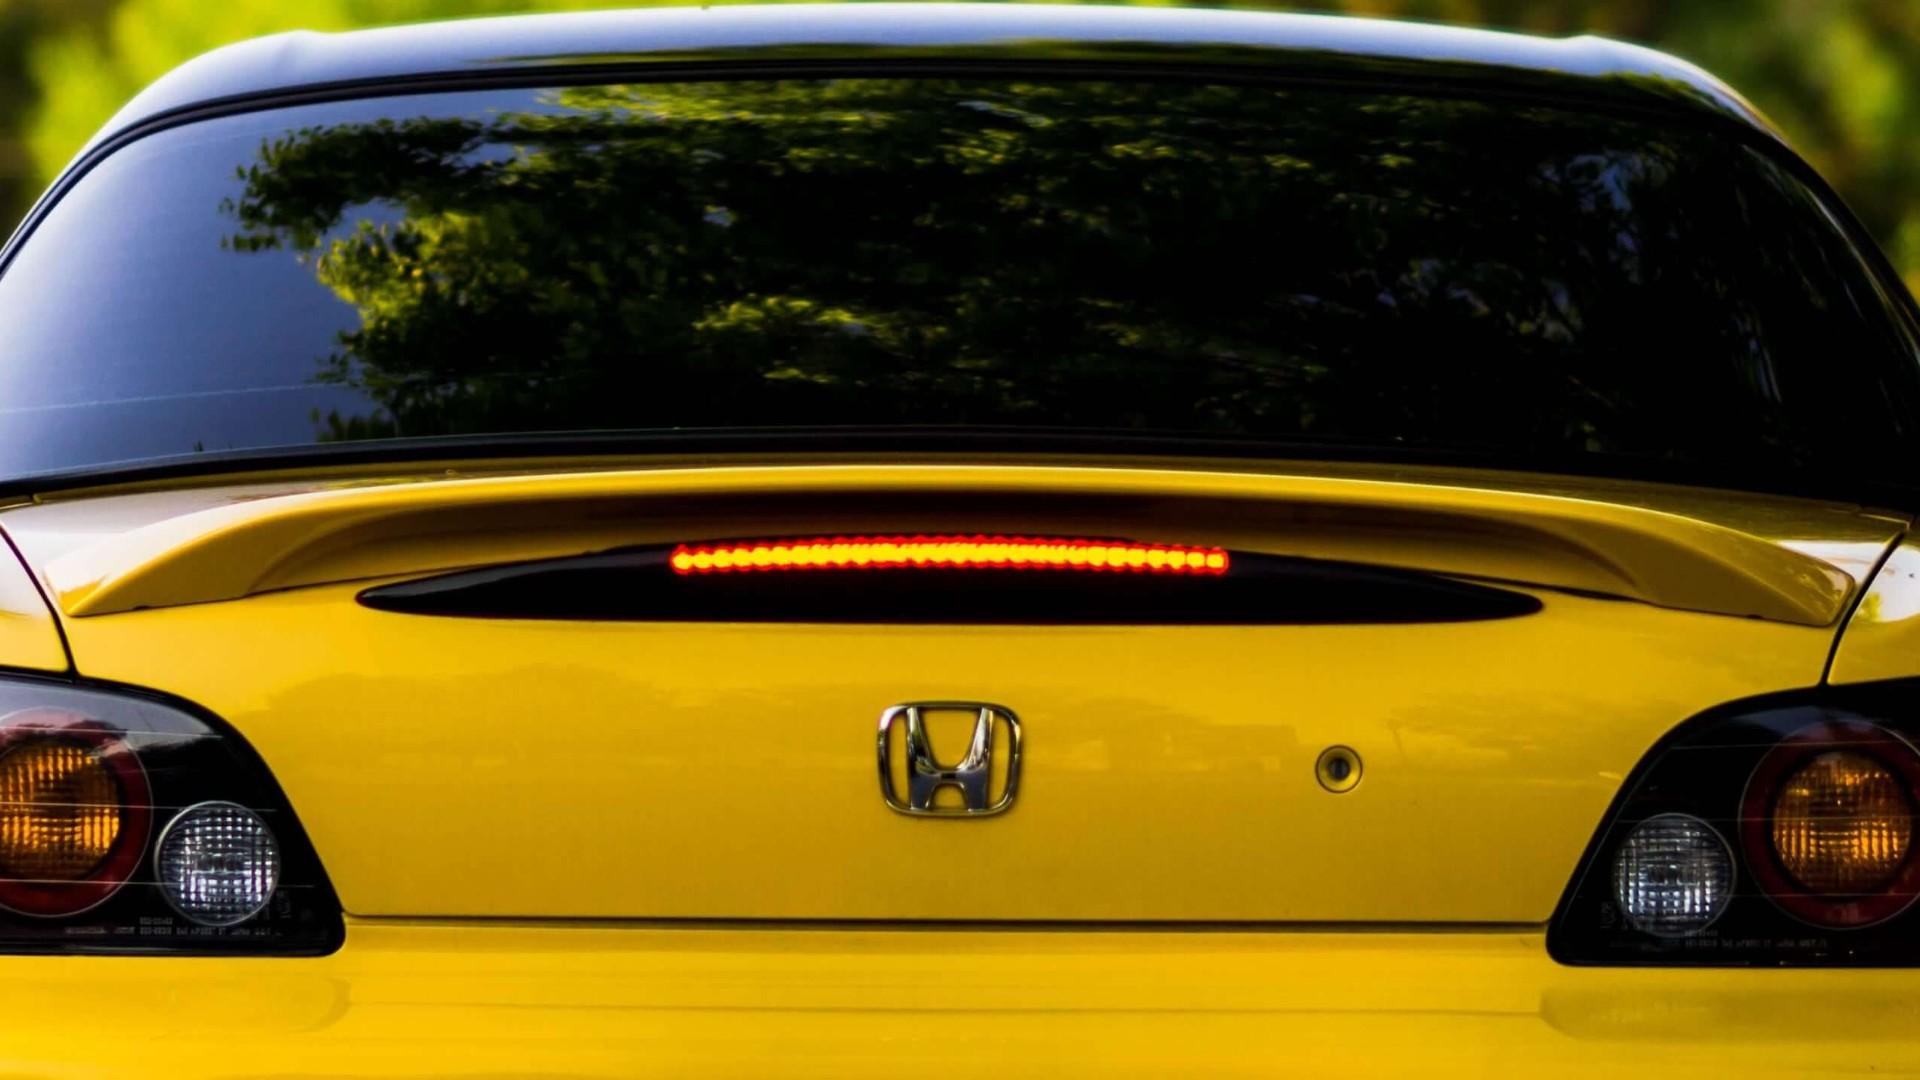 Honda S2000 Insurance Header Image